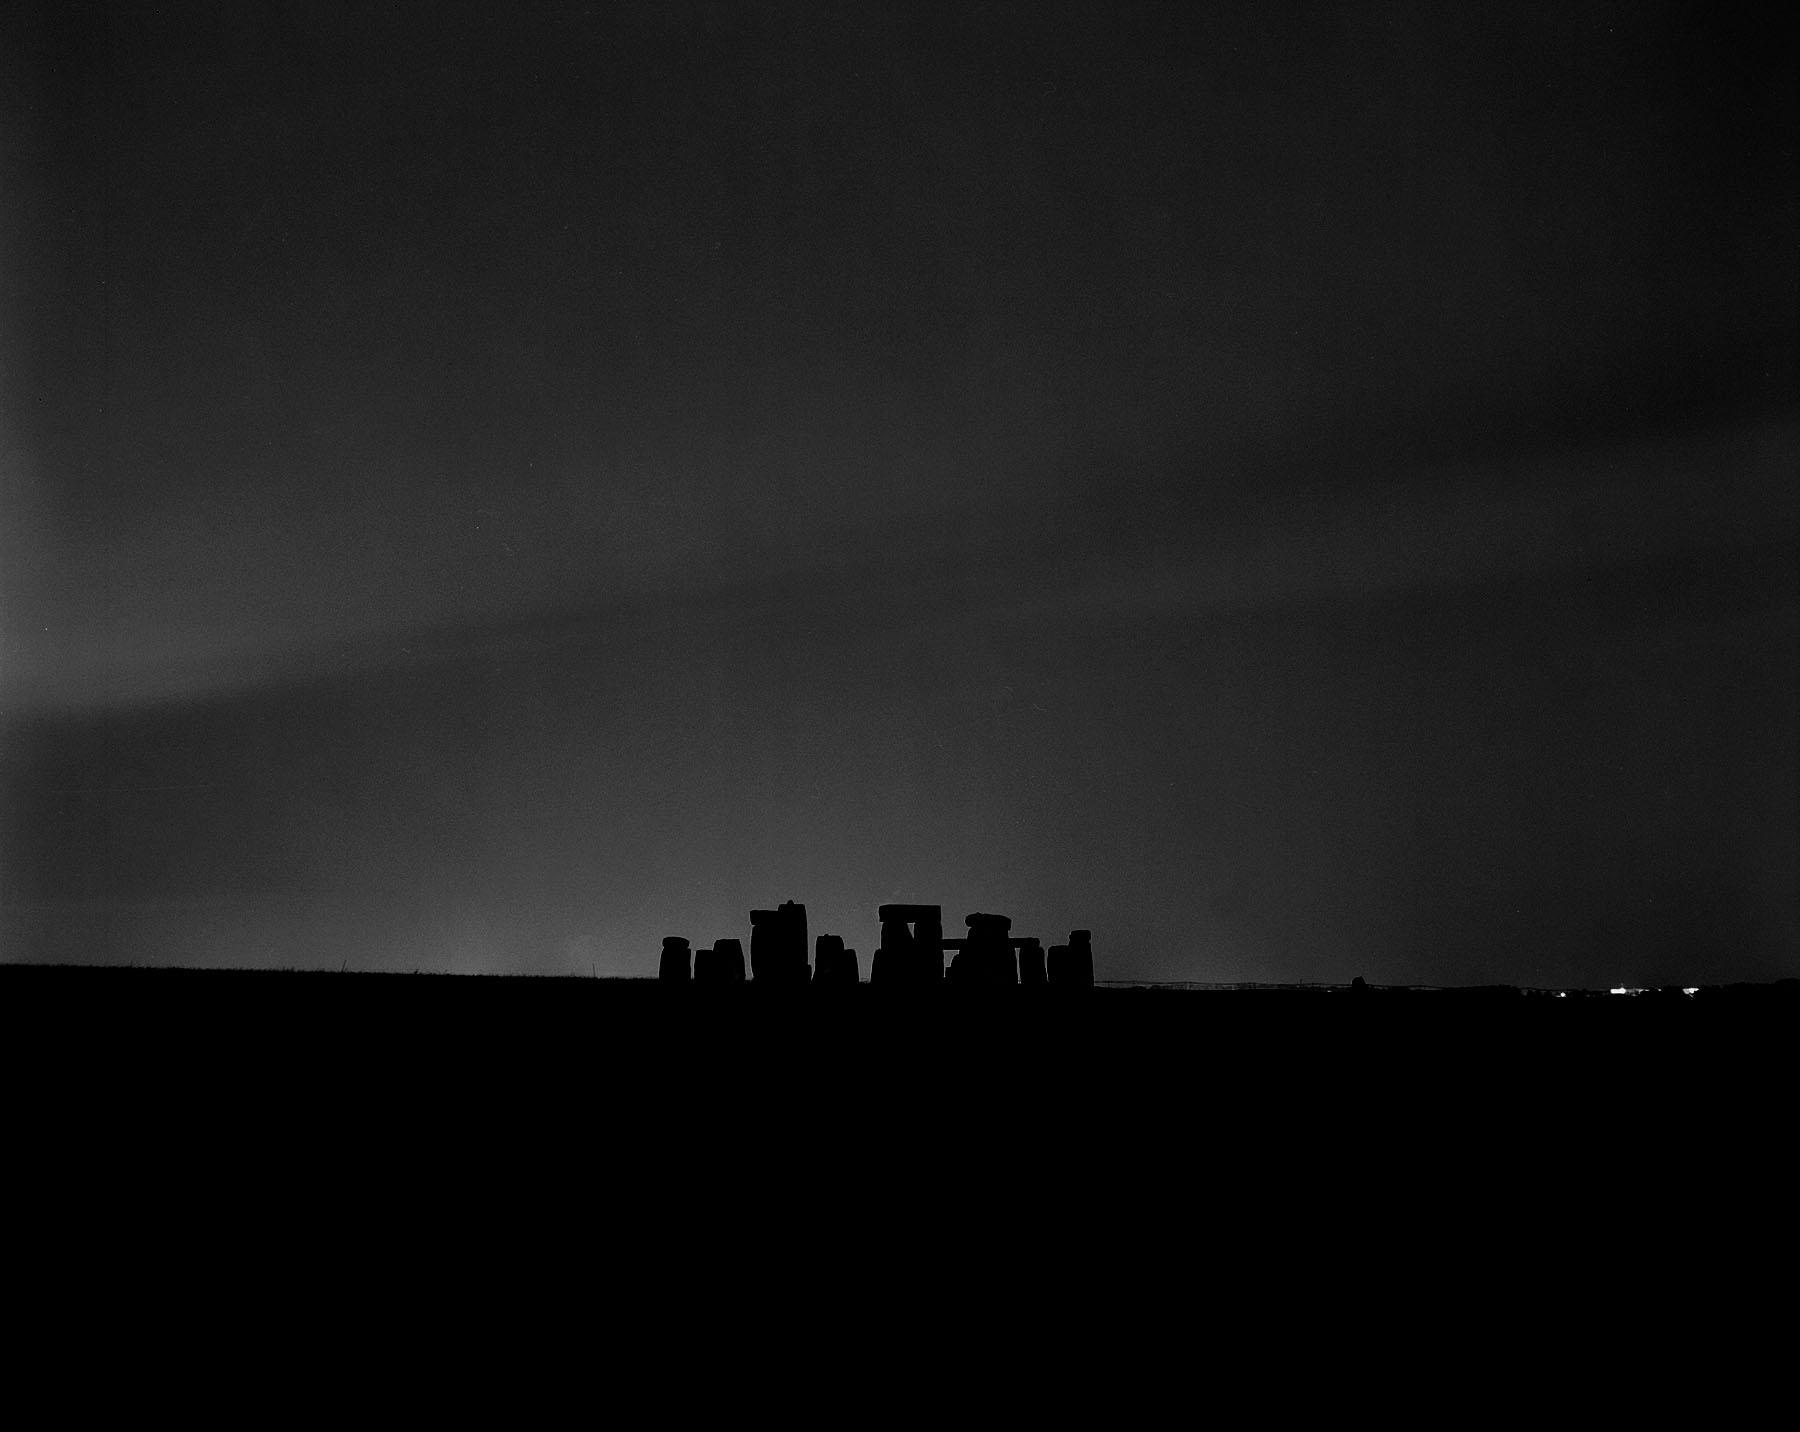 stonehenge, wiltshire, england,  2002